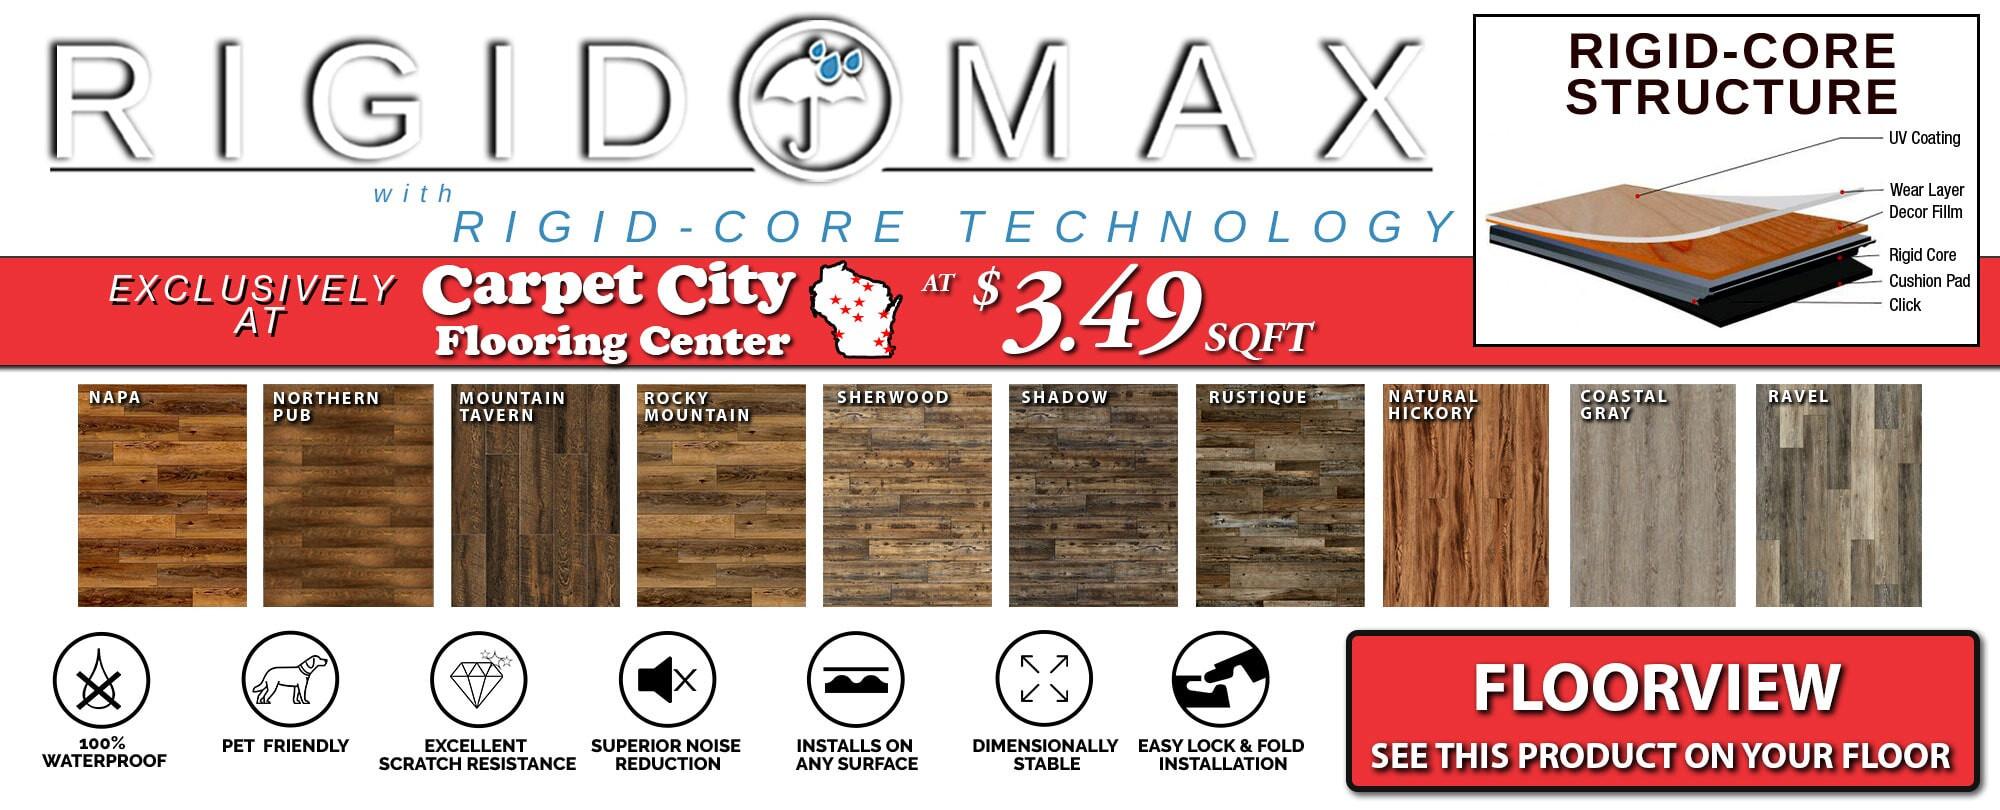 hardwood floor refinishing appleton wi of flooring in wisconsin from carpet city regarding shop rigid max a· contact us wisconsins largest flooring provider